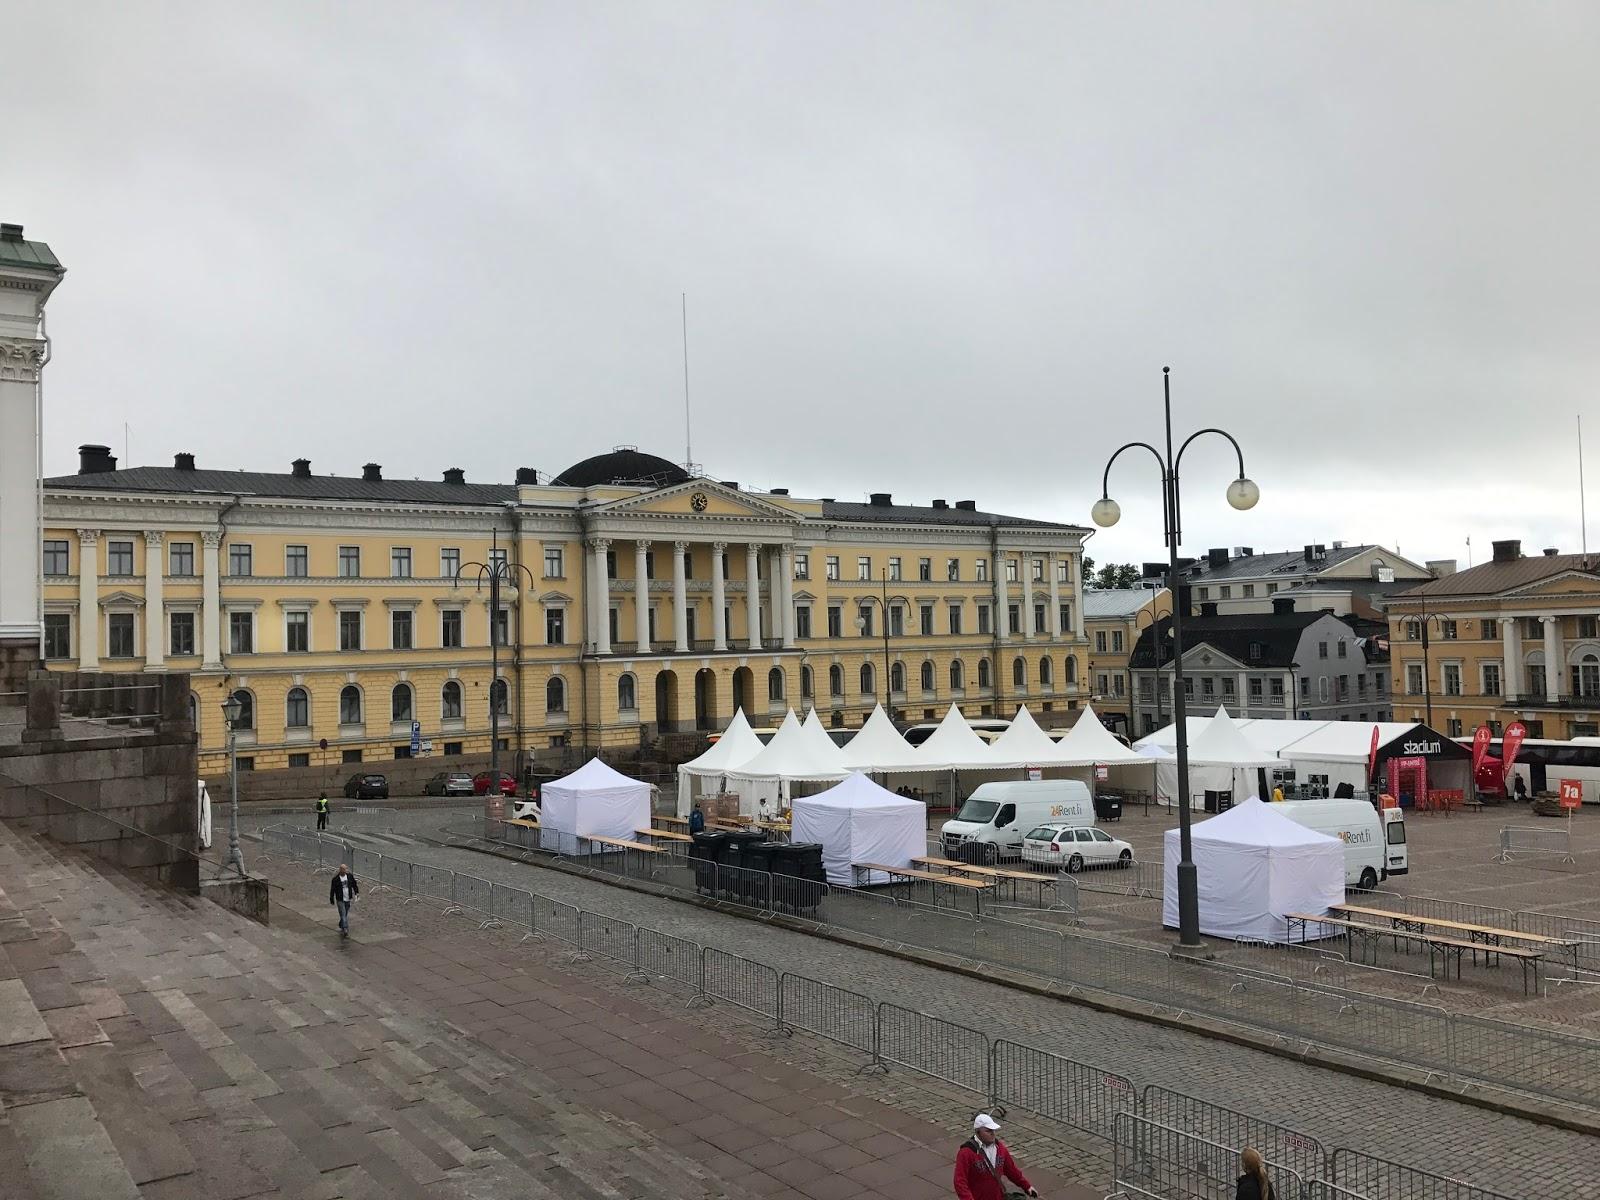 Universidade de Helsinki